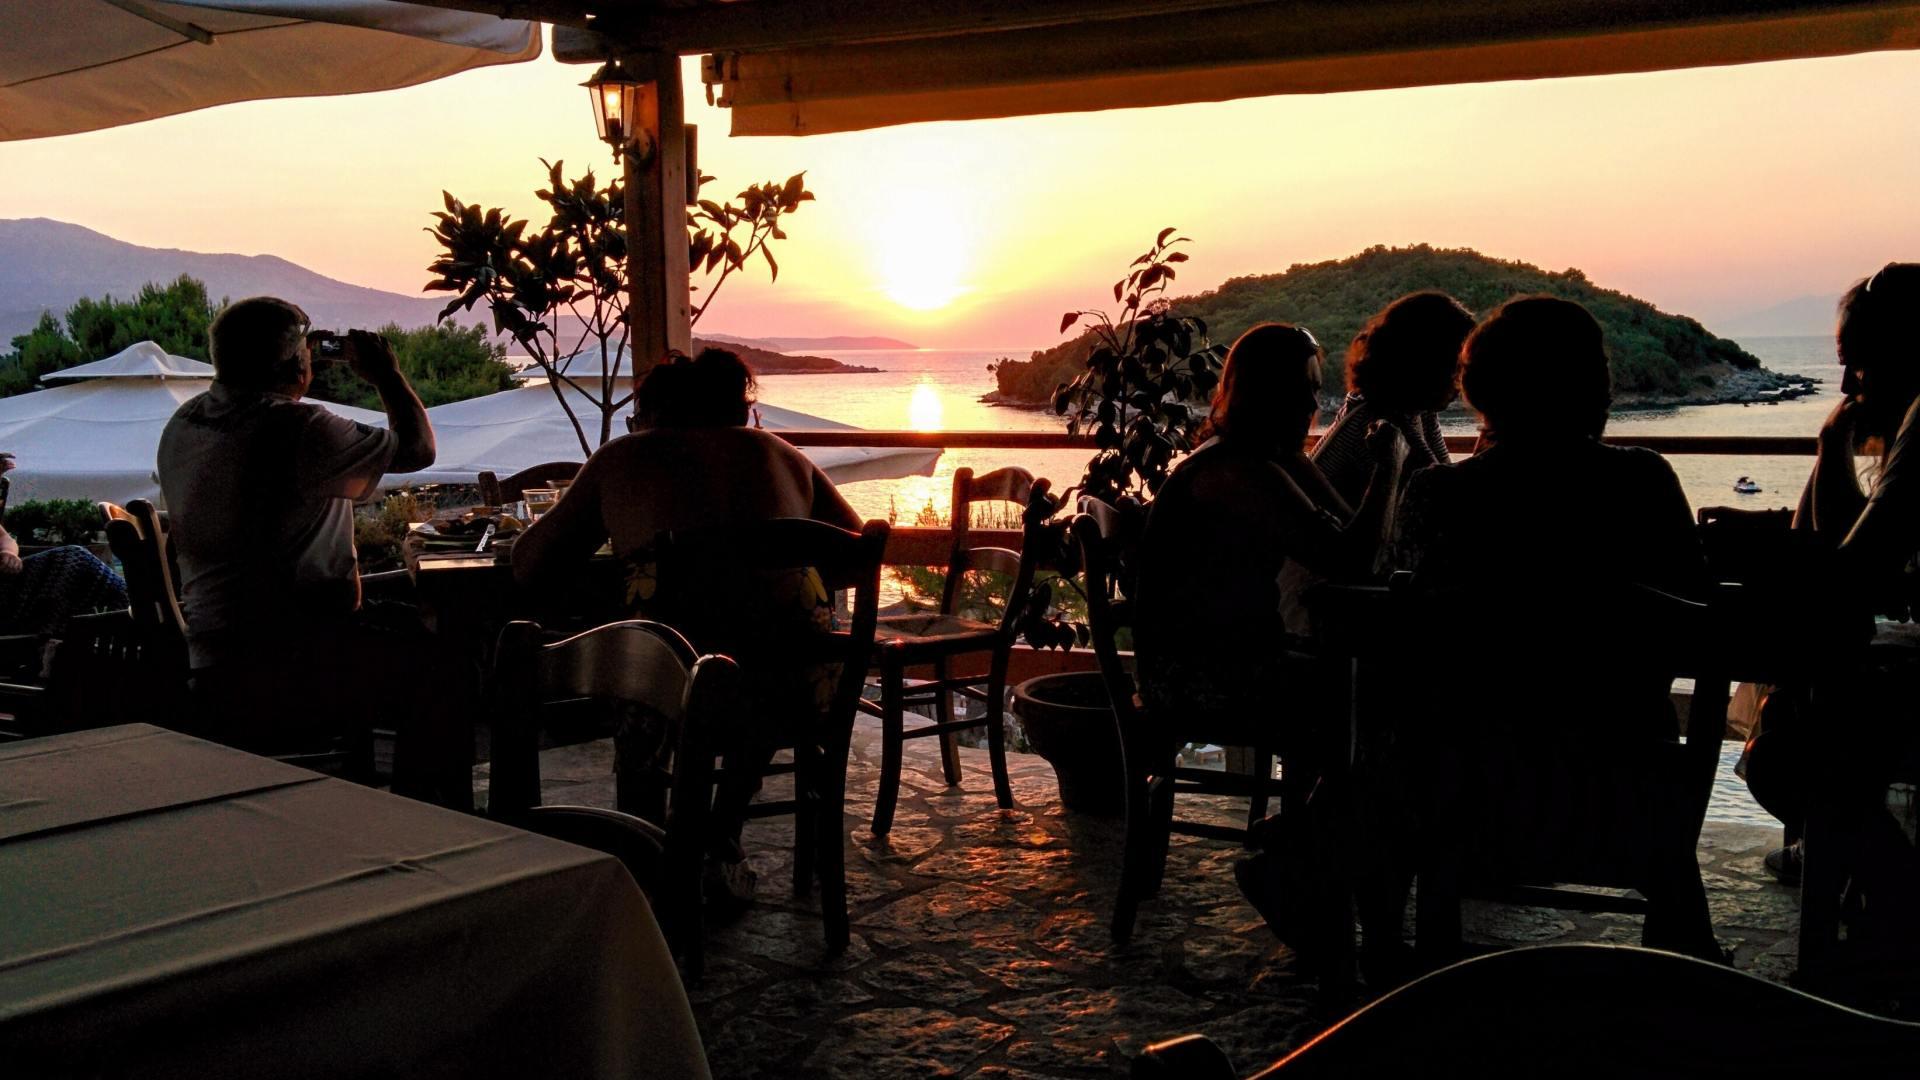 cafe overlooking sunset on the beach